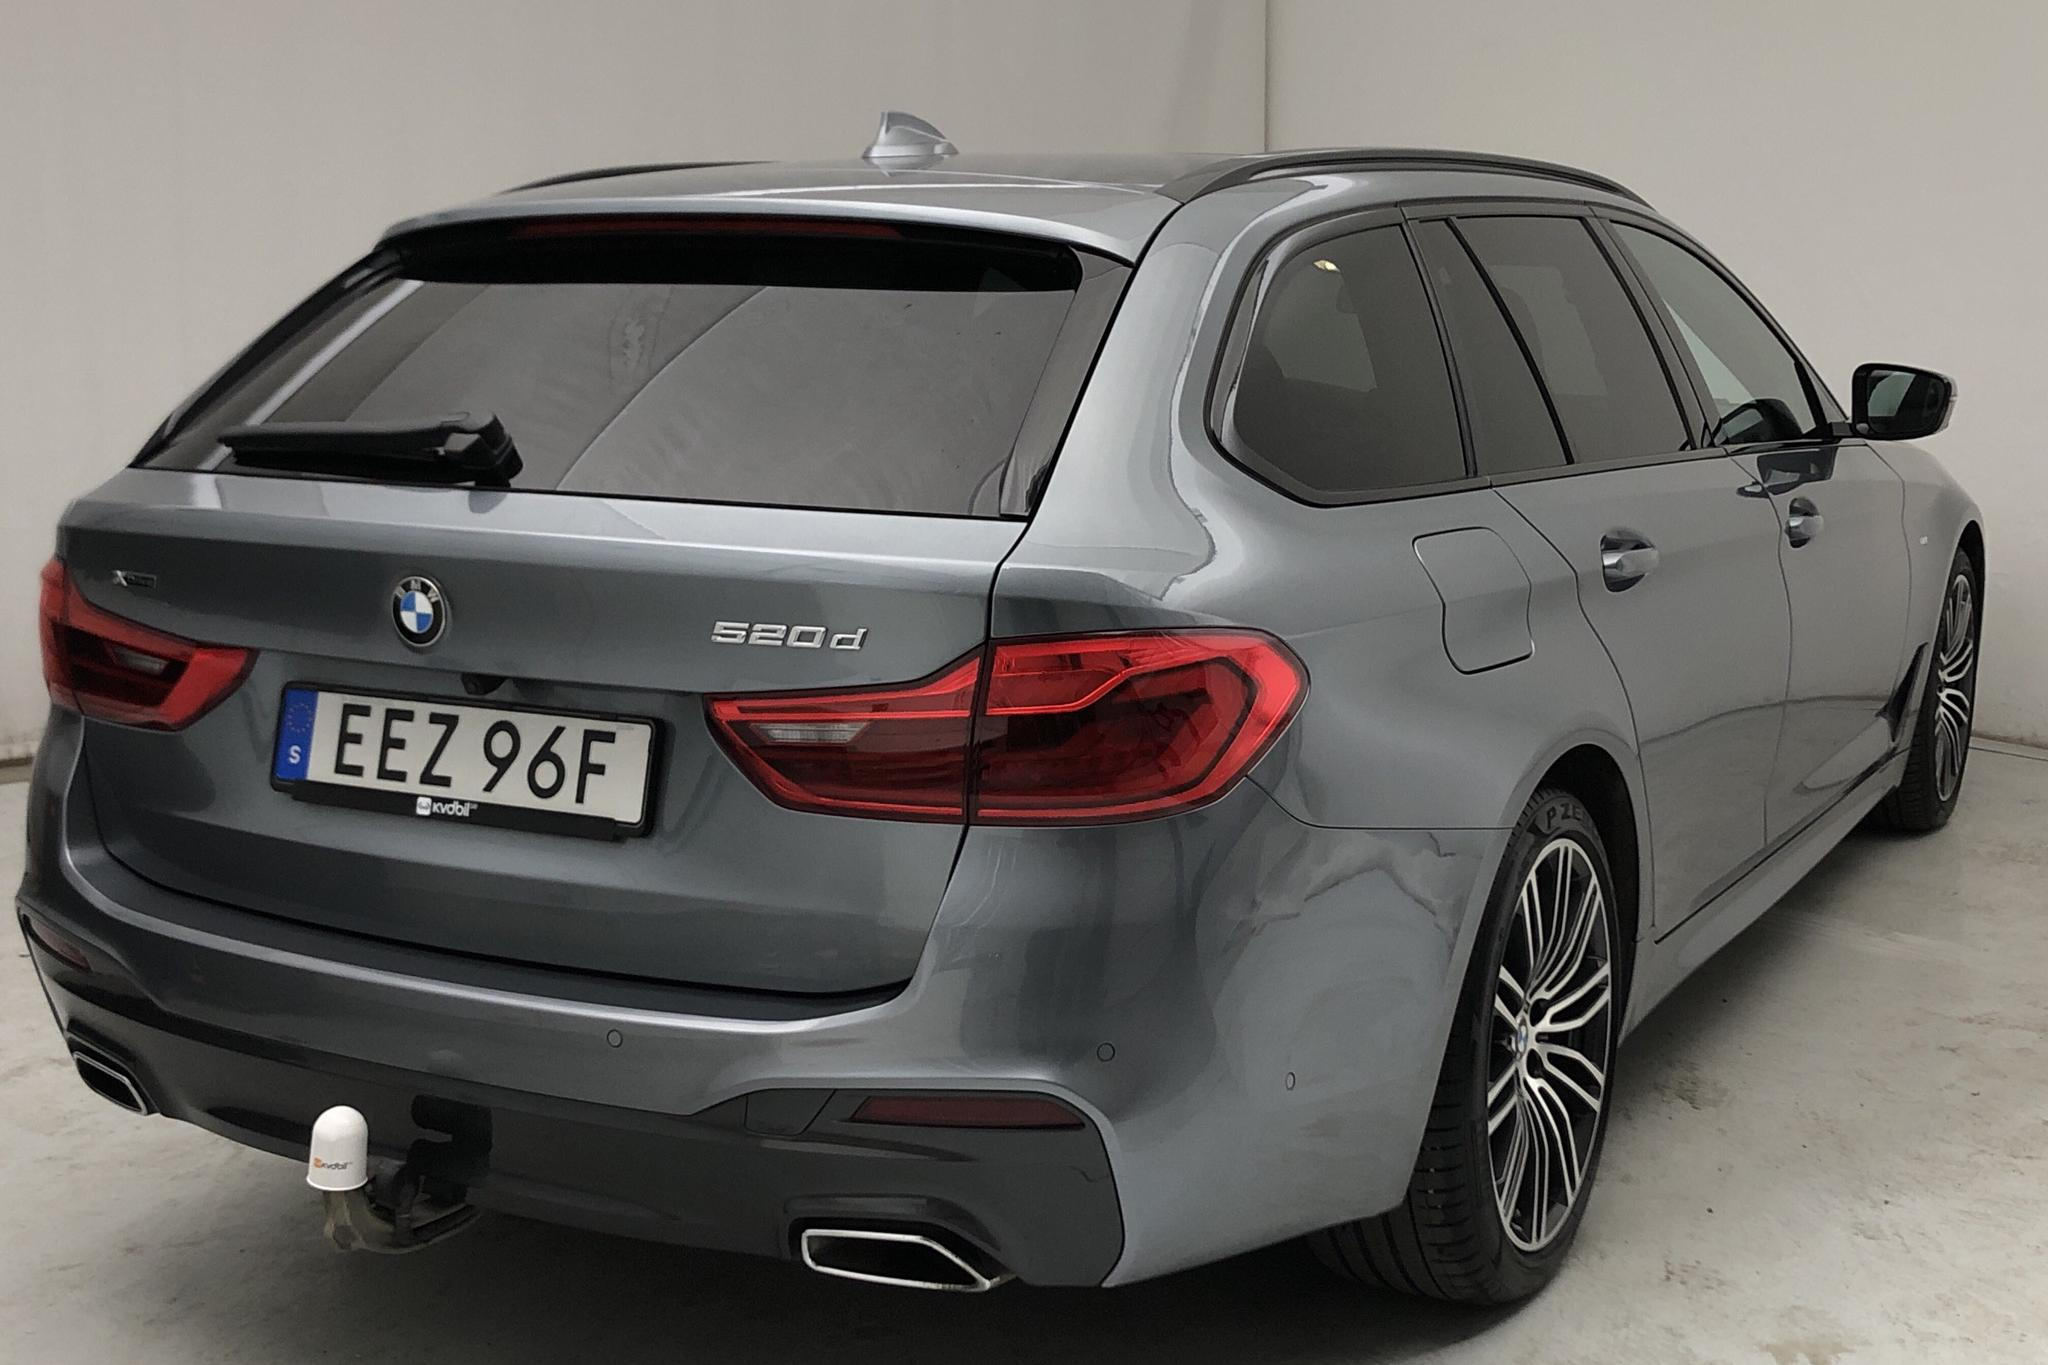 BMW 520d xDrive Touring MHEV, G31 (190hk) - 2 212 mil - Automat - blå - 2020